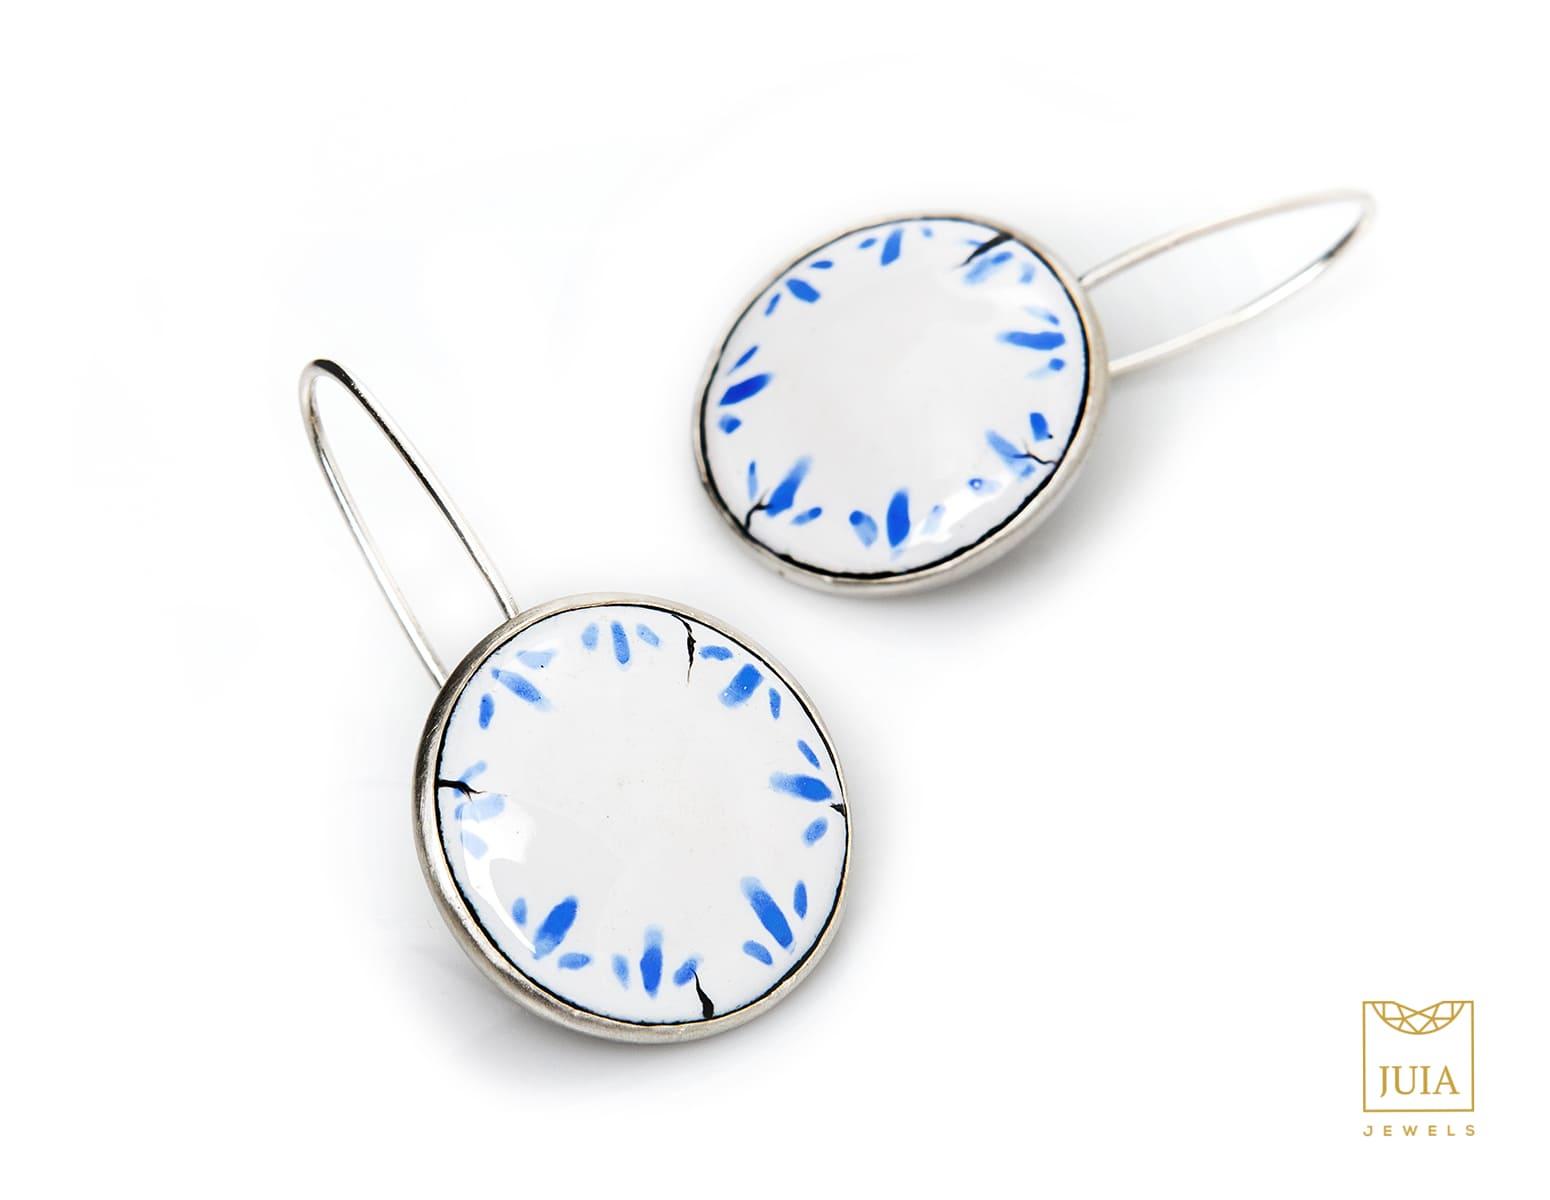 pendientes de plata para mujer, joyas artesanales, joyas para regalar, juia jewels barcelona, joyasmarket